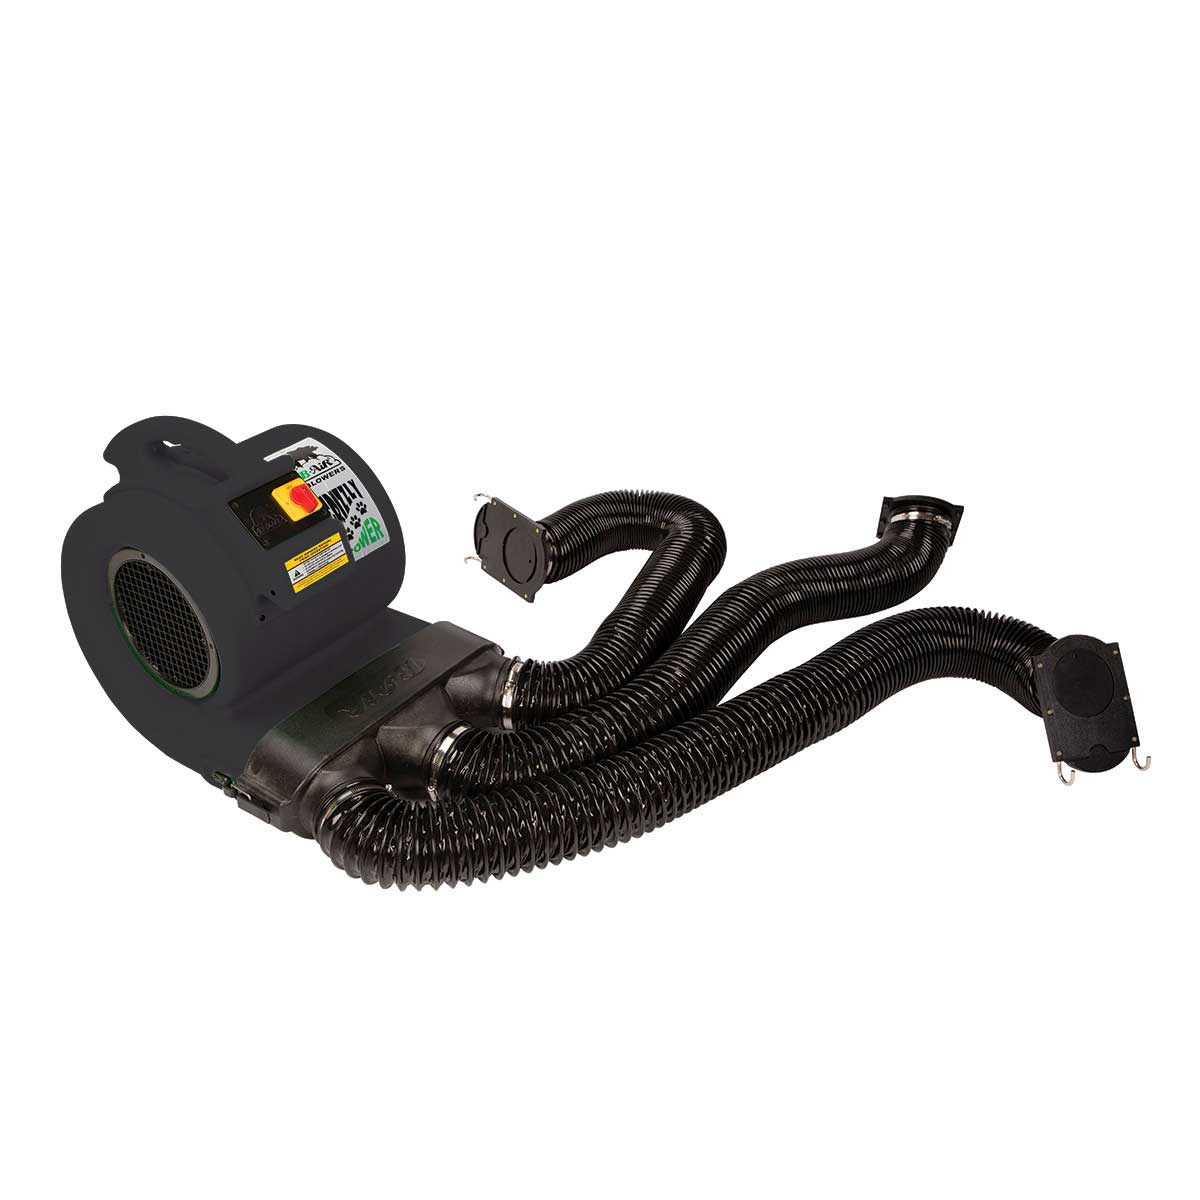 Professional Grooming Black Grizzly B-Air Dryer ETL & Den Drying Kit